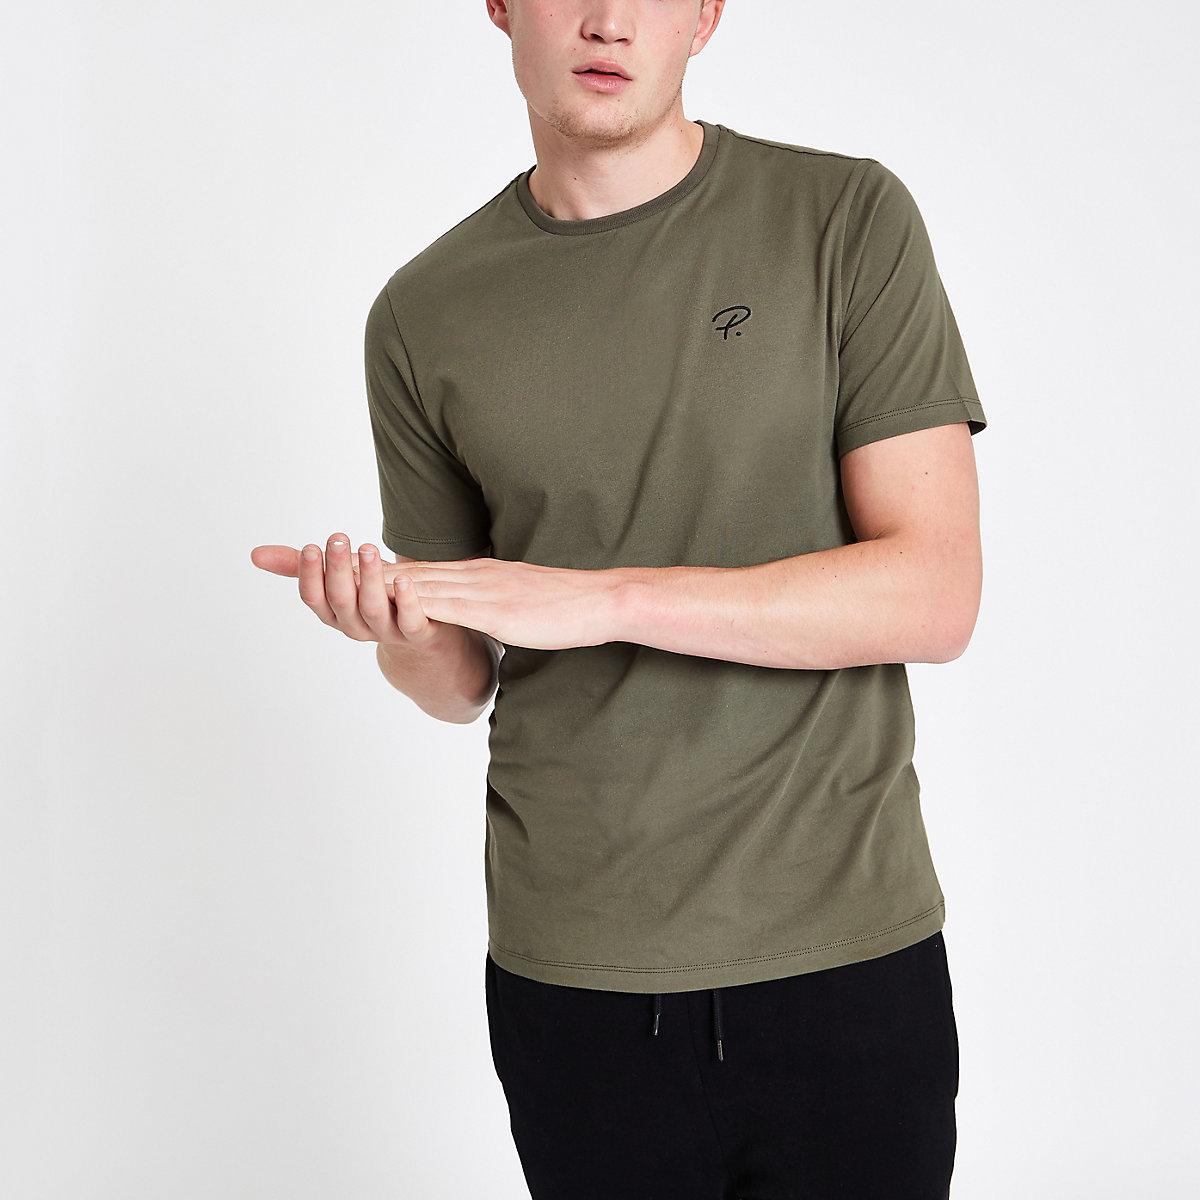 Khaki 'P.' slim fit crew neck T-shirt